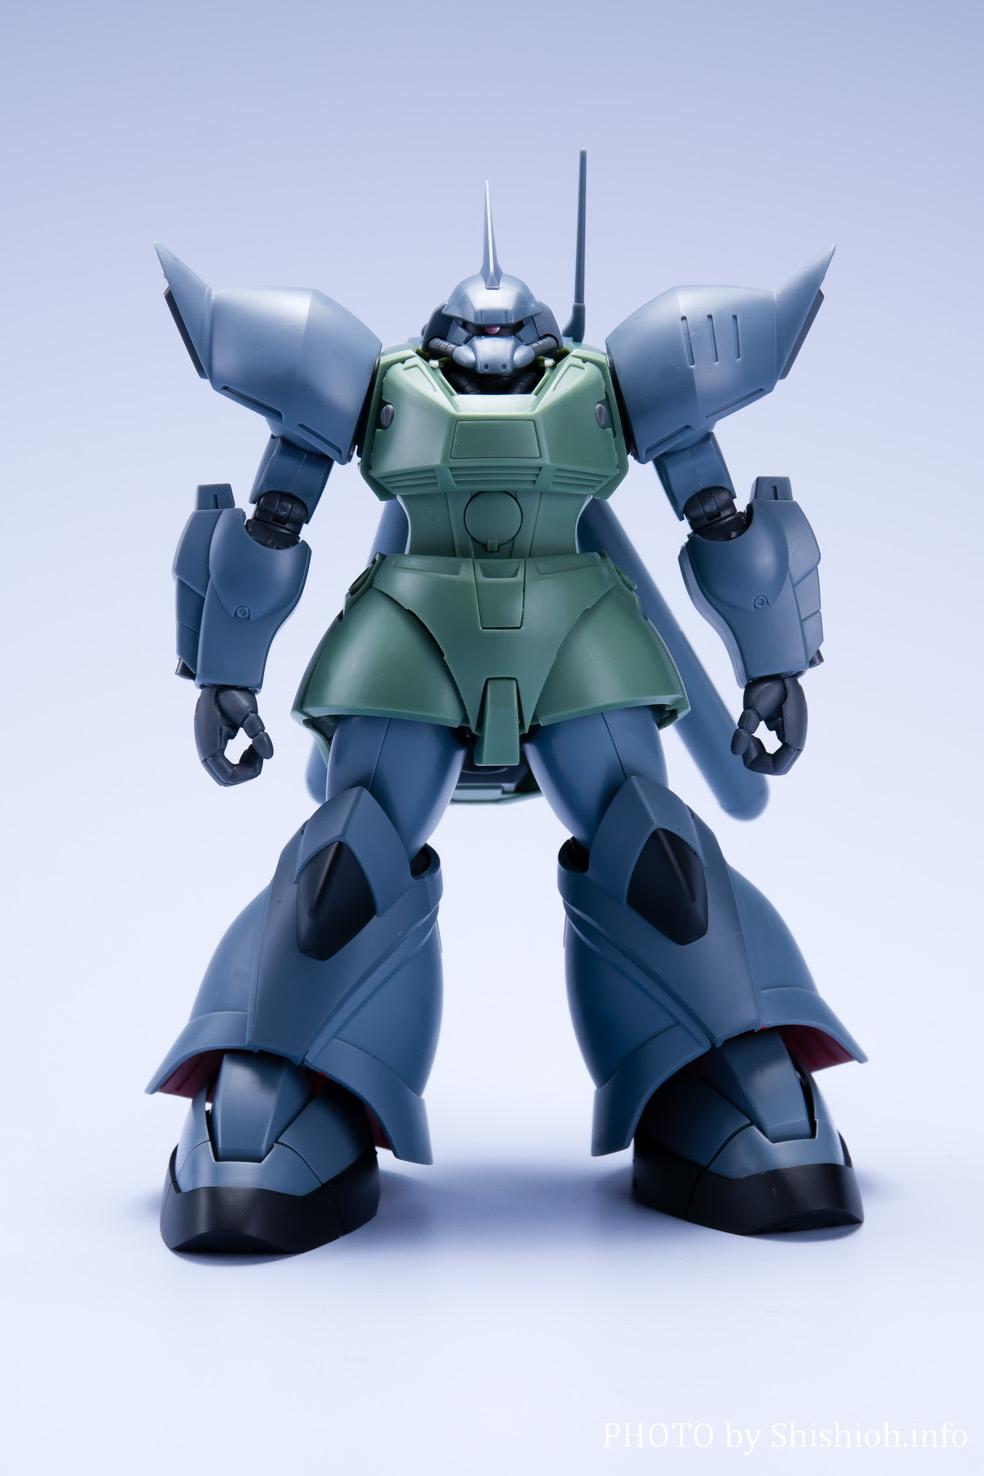 ROBOT魂 <SIDE MS> MS-14F ゲルググM ver. A.N.I.M.E.